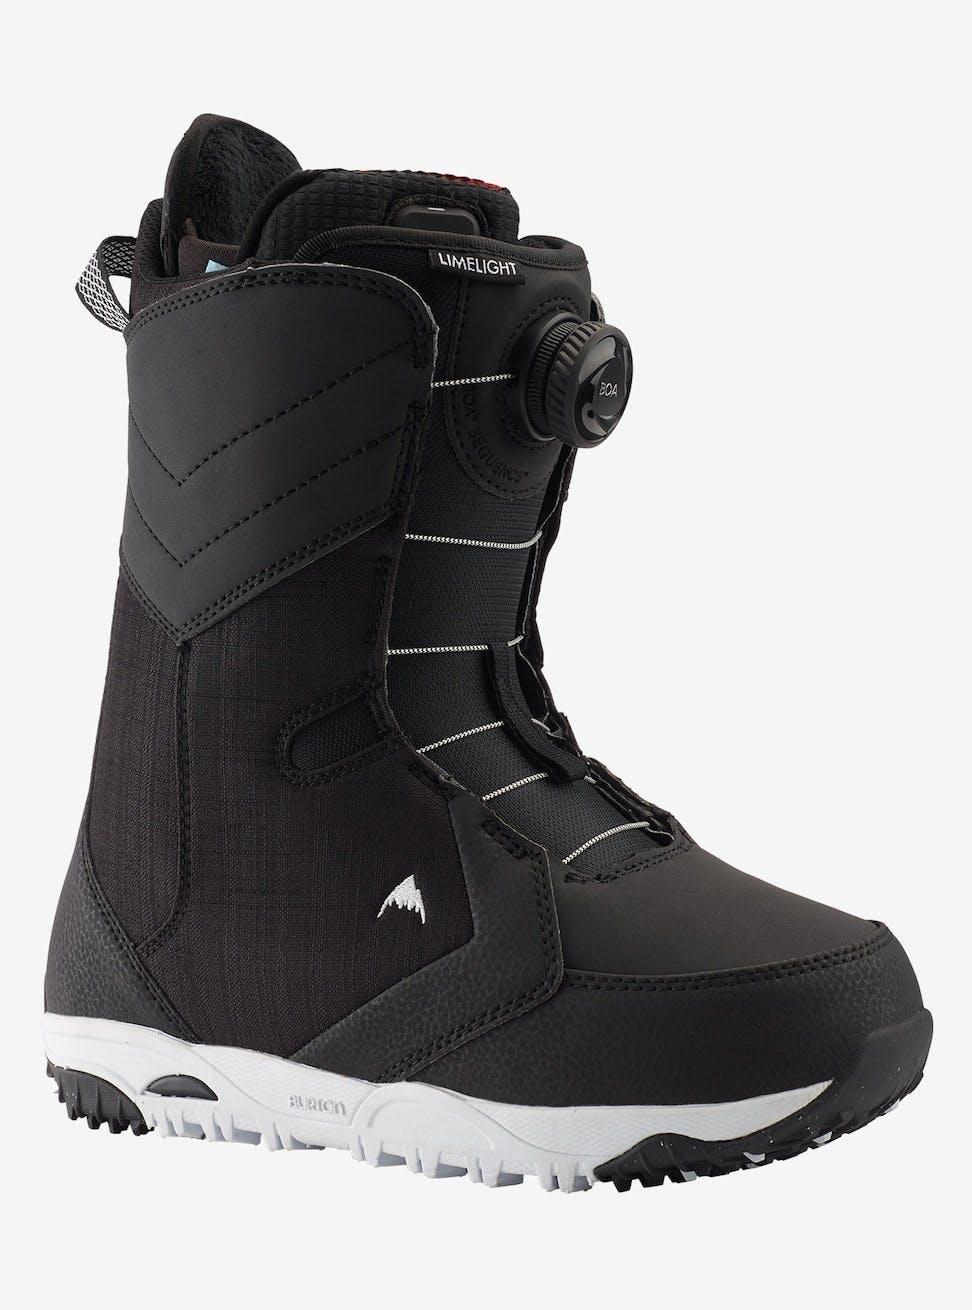 Burton Limelight BOA Heat Snowboard Boots · 2021